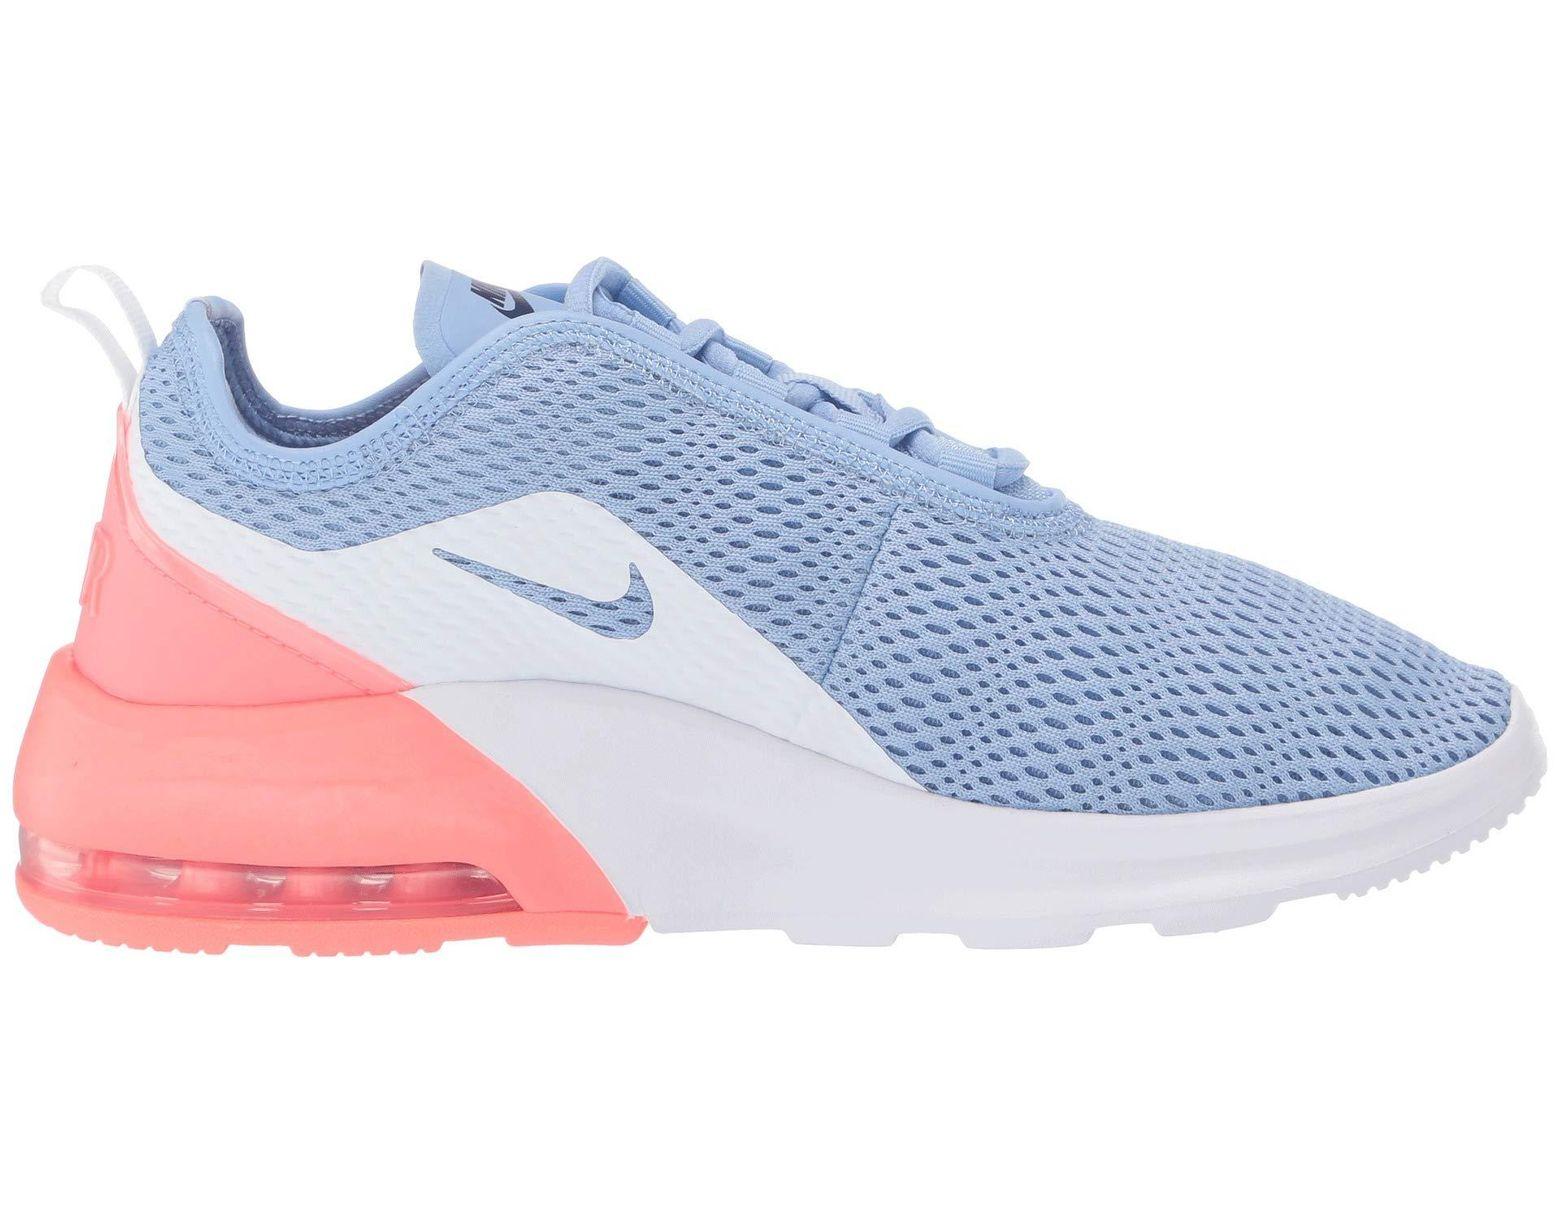 meet 1b322 0638b Nike Air Max Motion 2 (white laser Fuchsia pale Pink) Women s Running Shoes  - Lyst